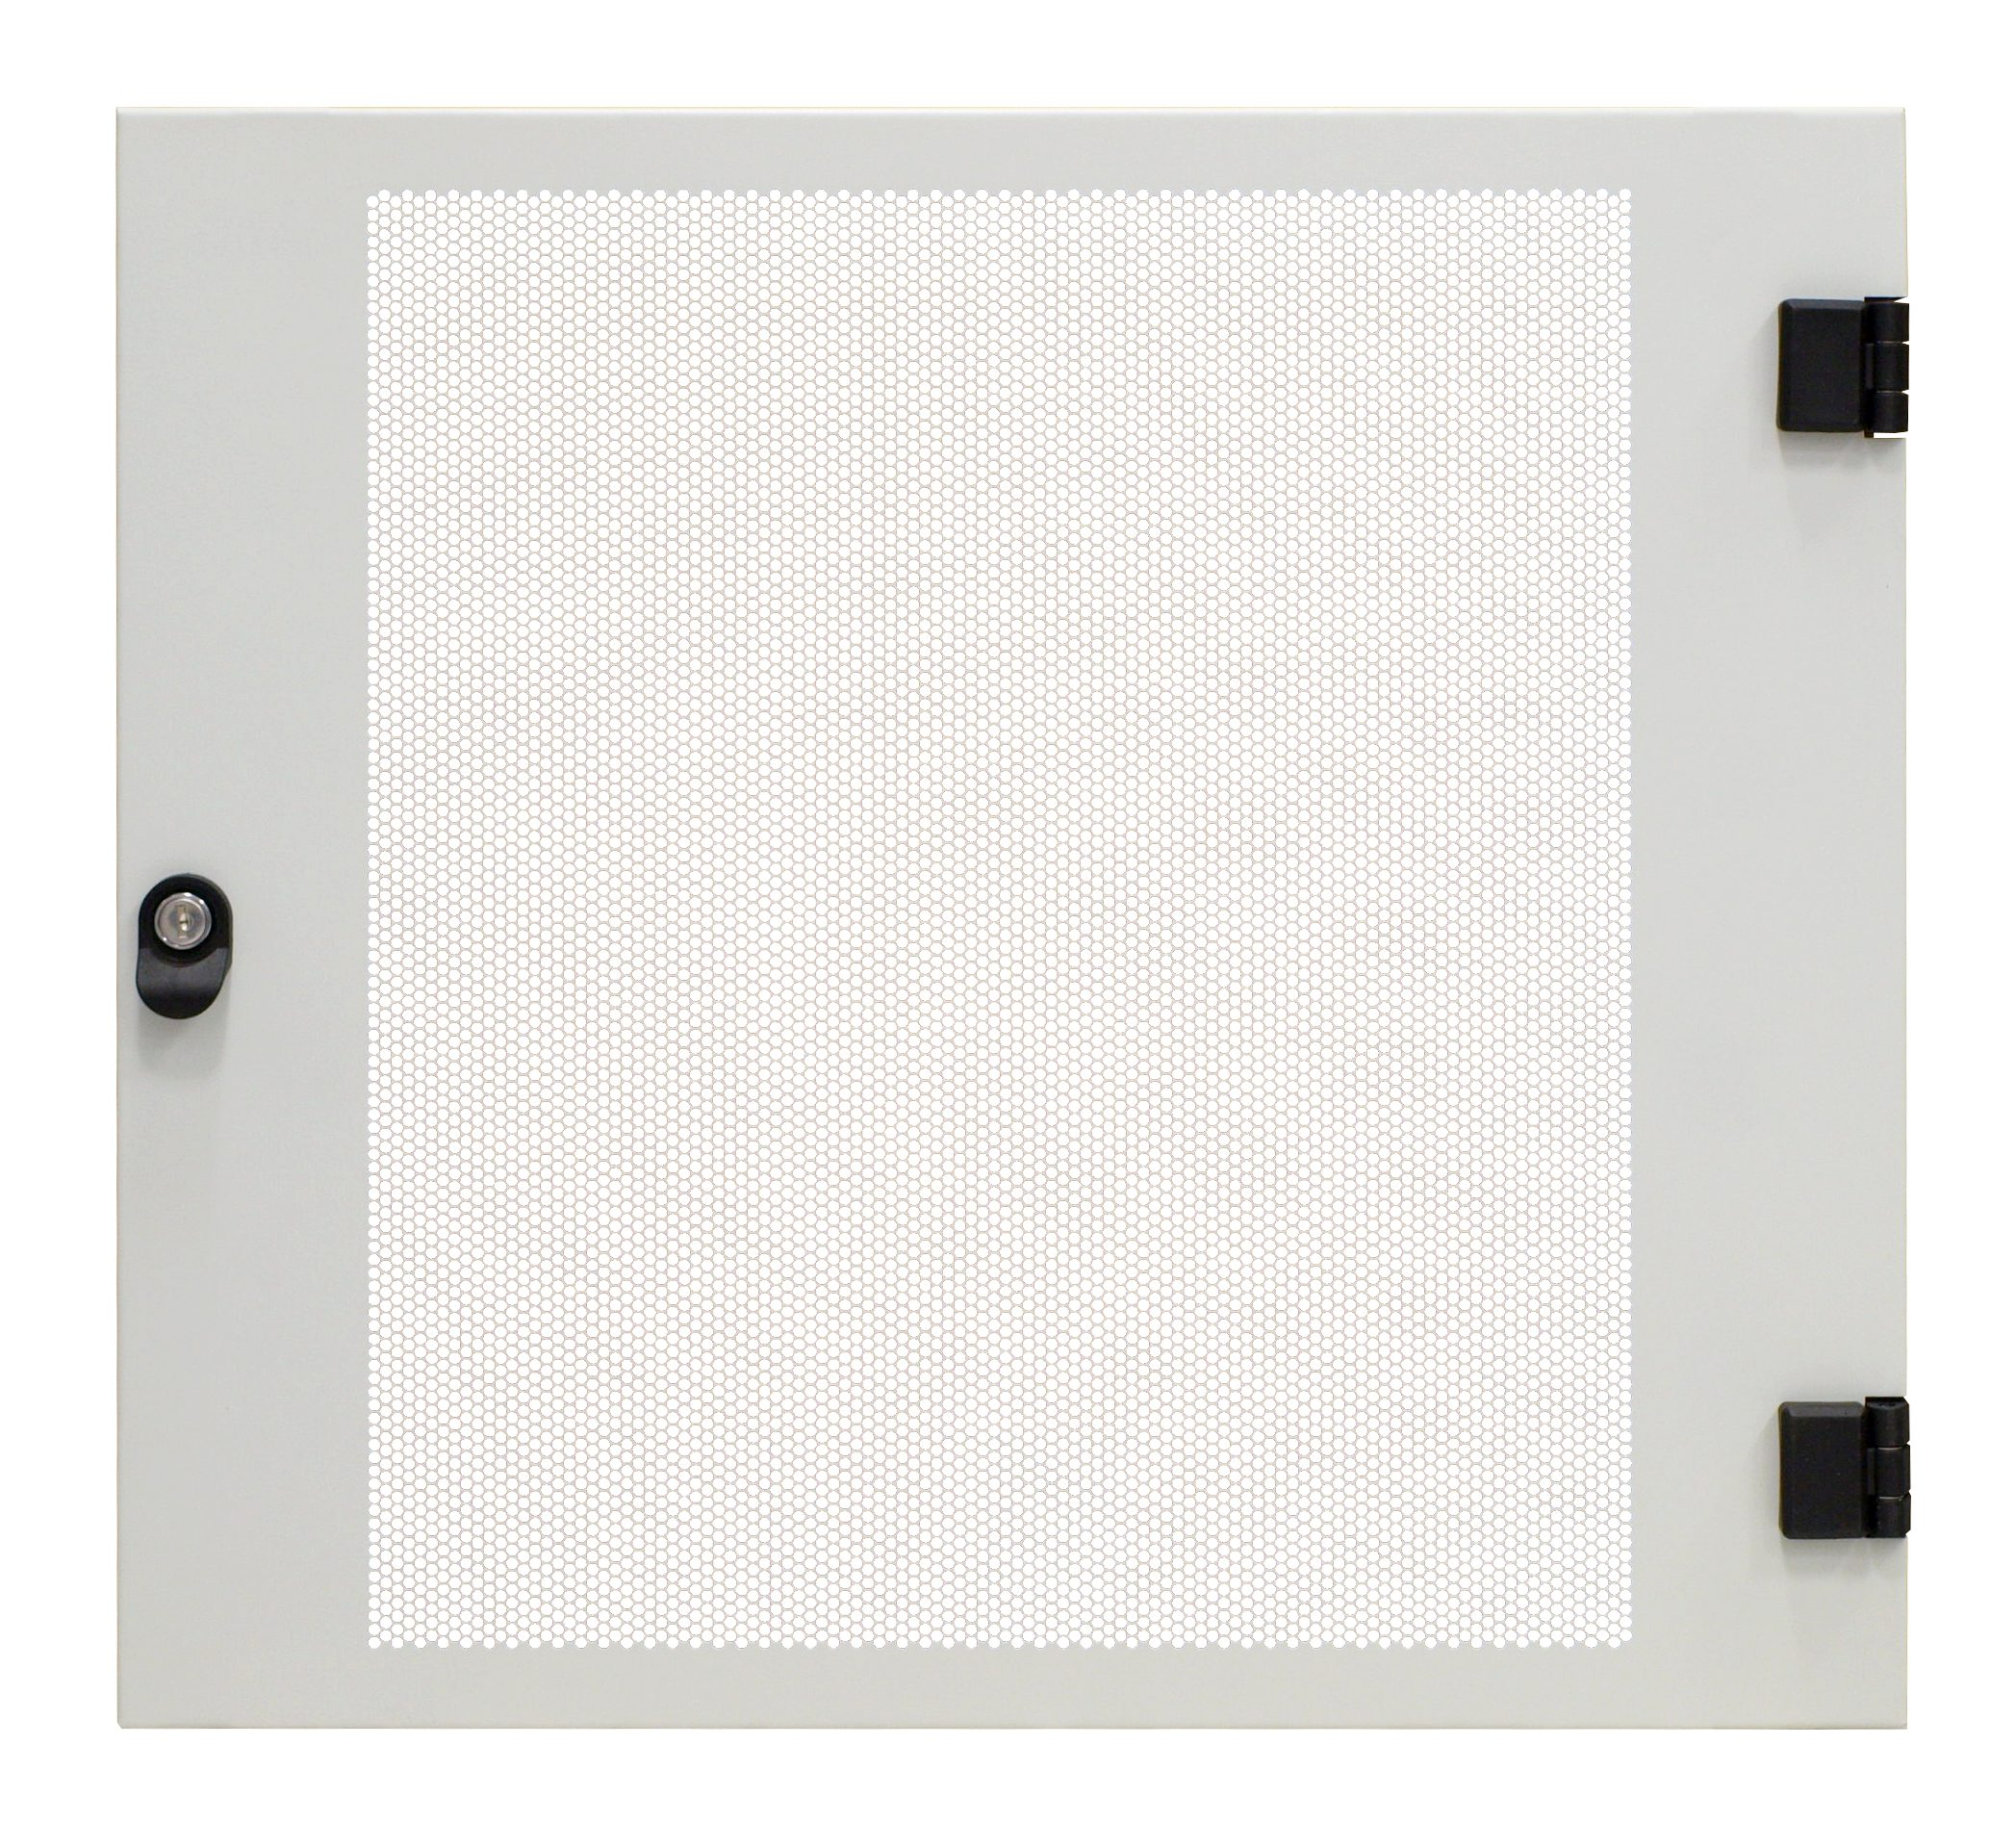 1 Stk Metall-Tür perforiert 80% f. DW-Schrank 18HE, B=600, RAL7035 DWRT1861--